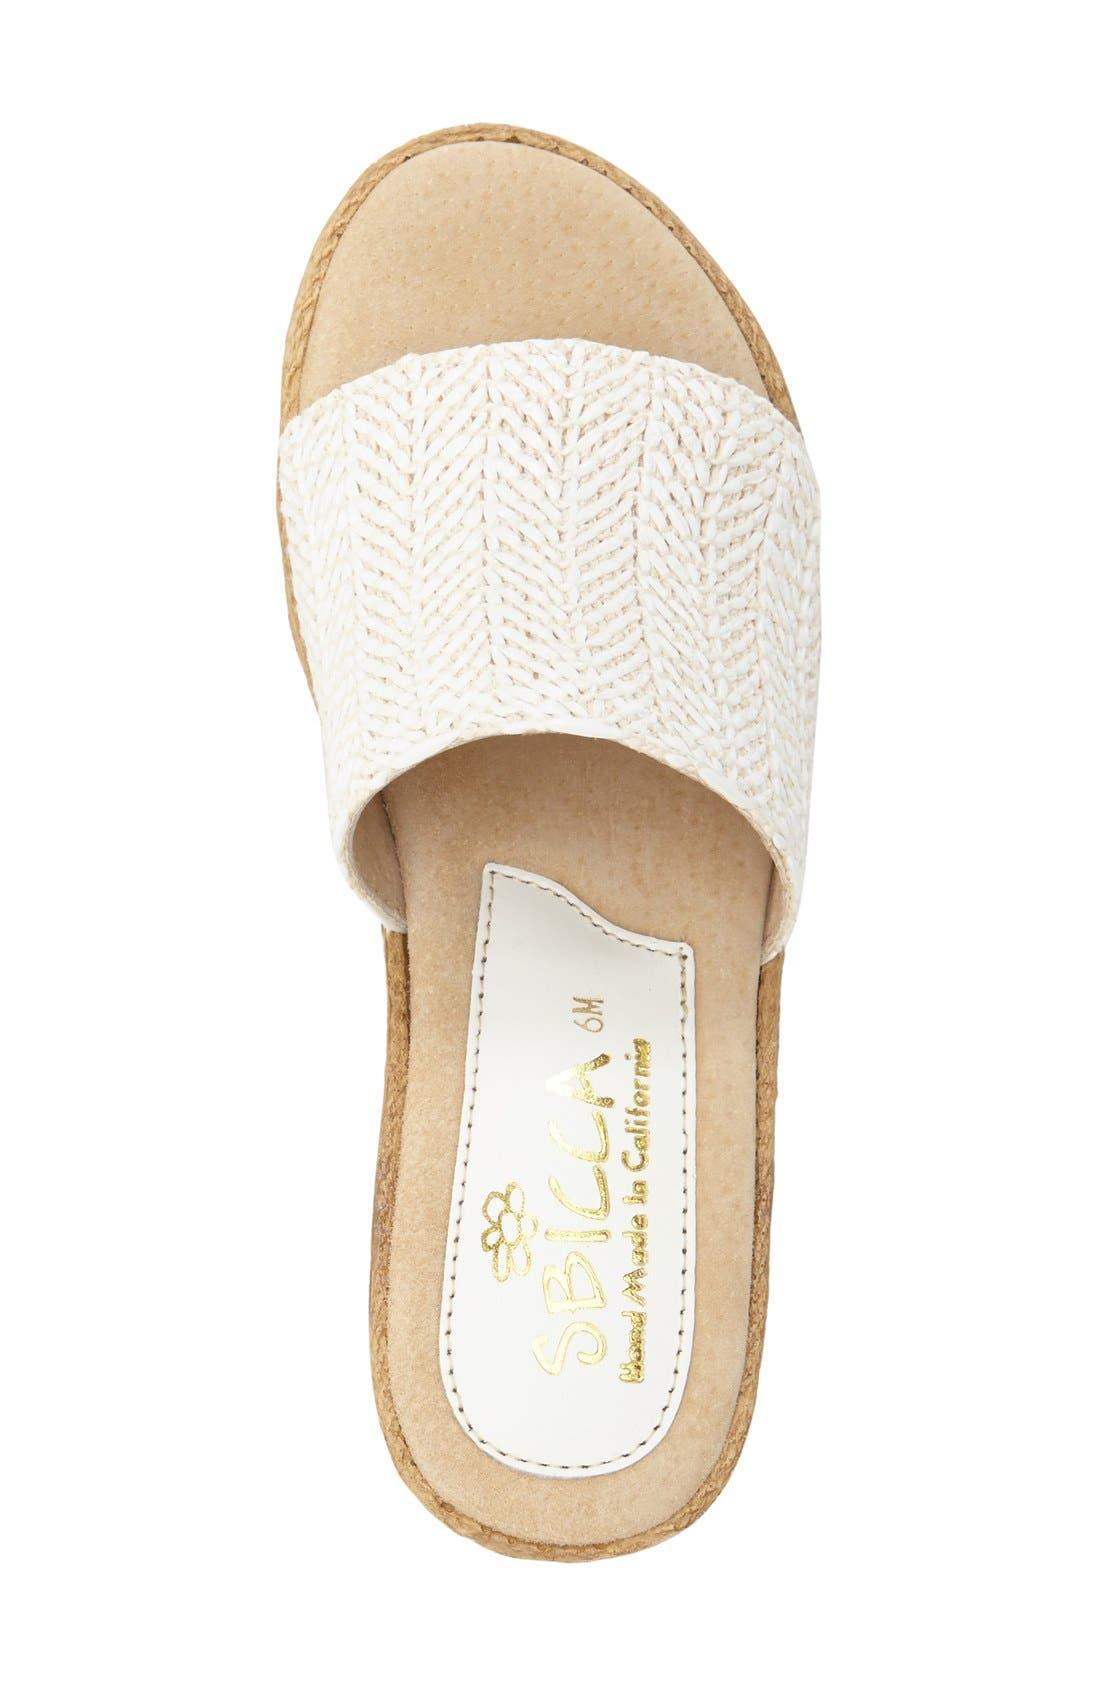 Alternate Image 3  - Sbicca 'Fiorella' Sandal (Women)